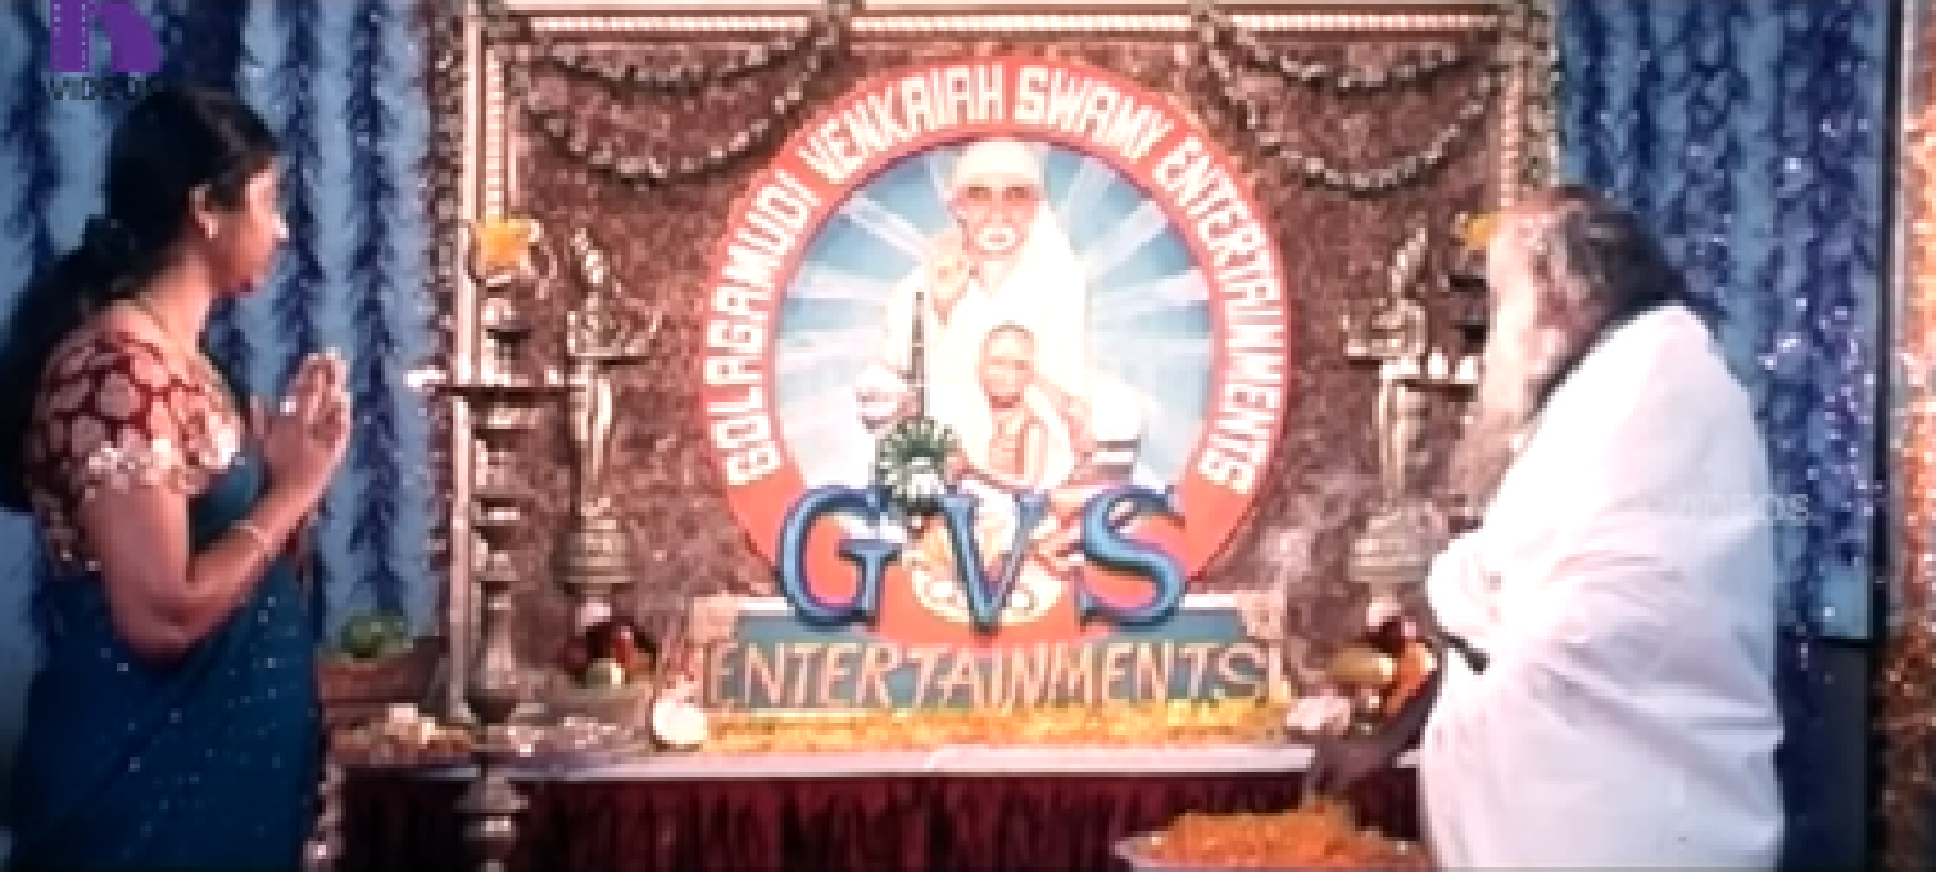 Golagamudi Venkaiah Swarmy Entertainments (India)